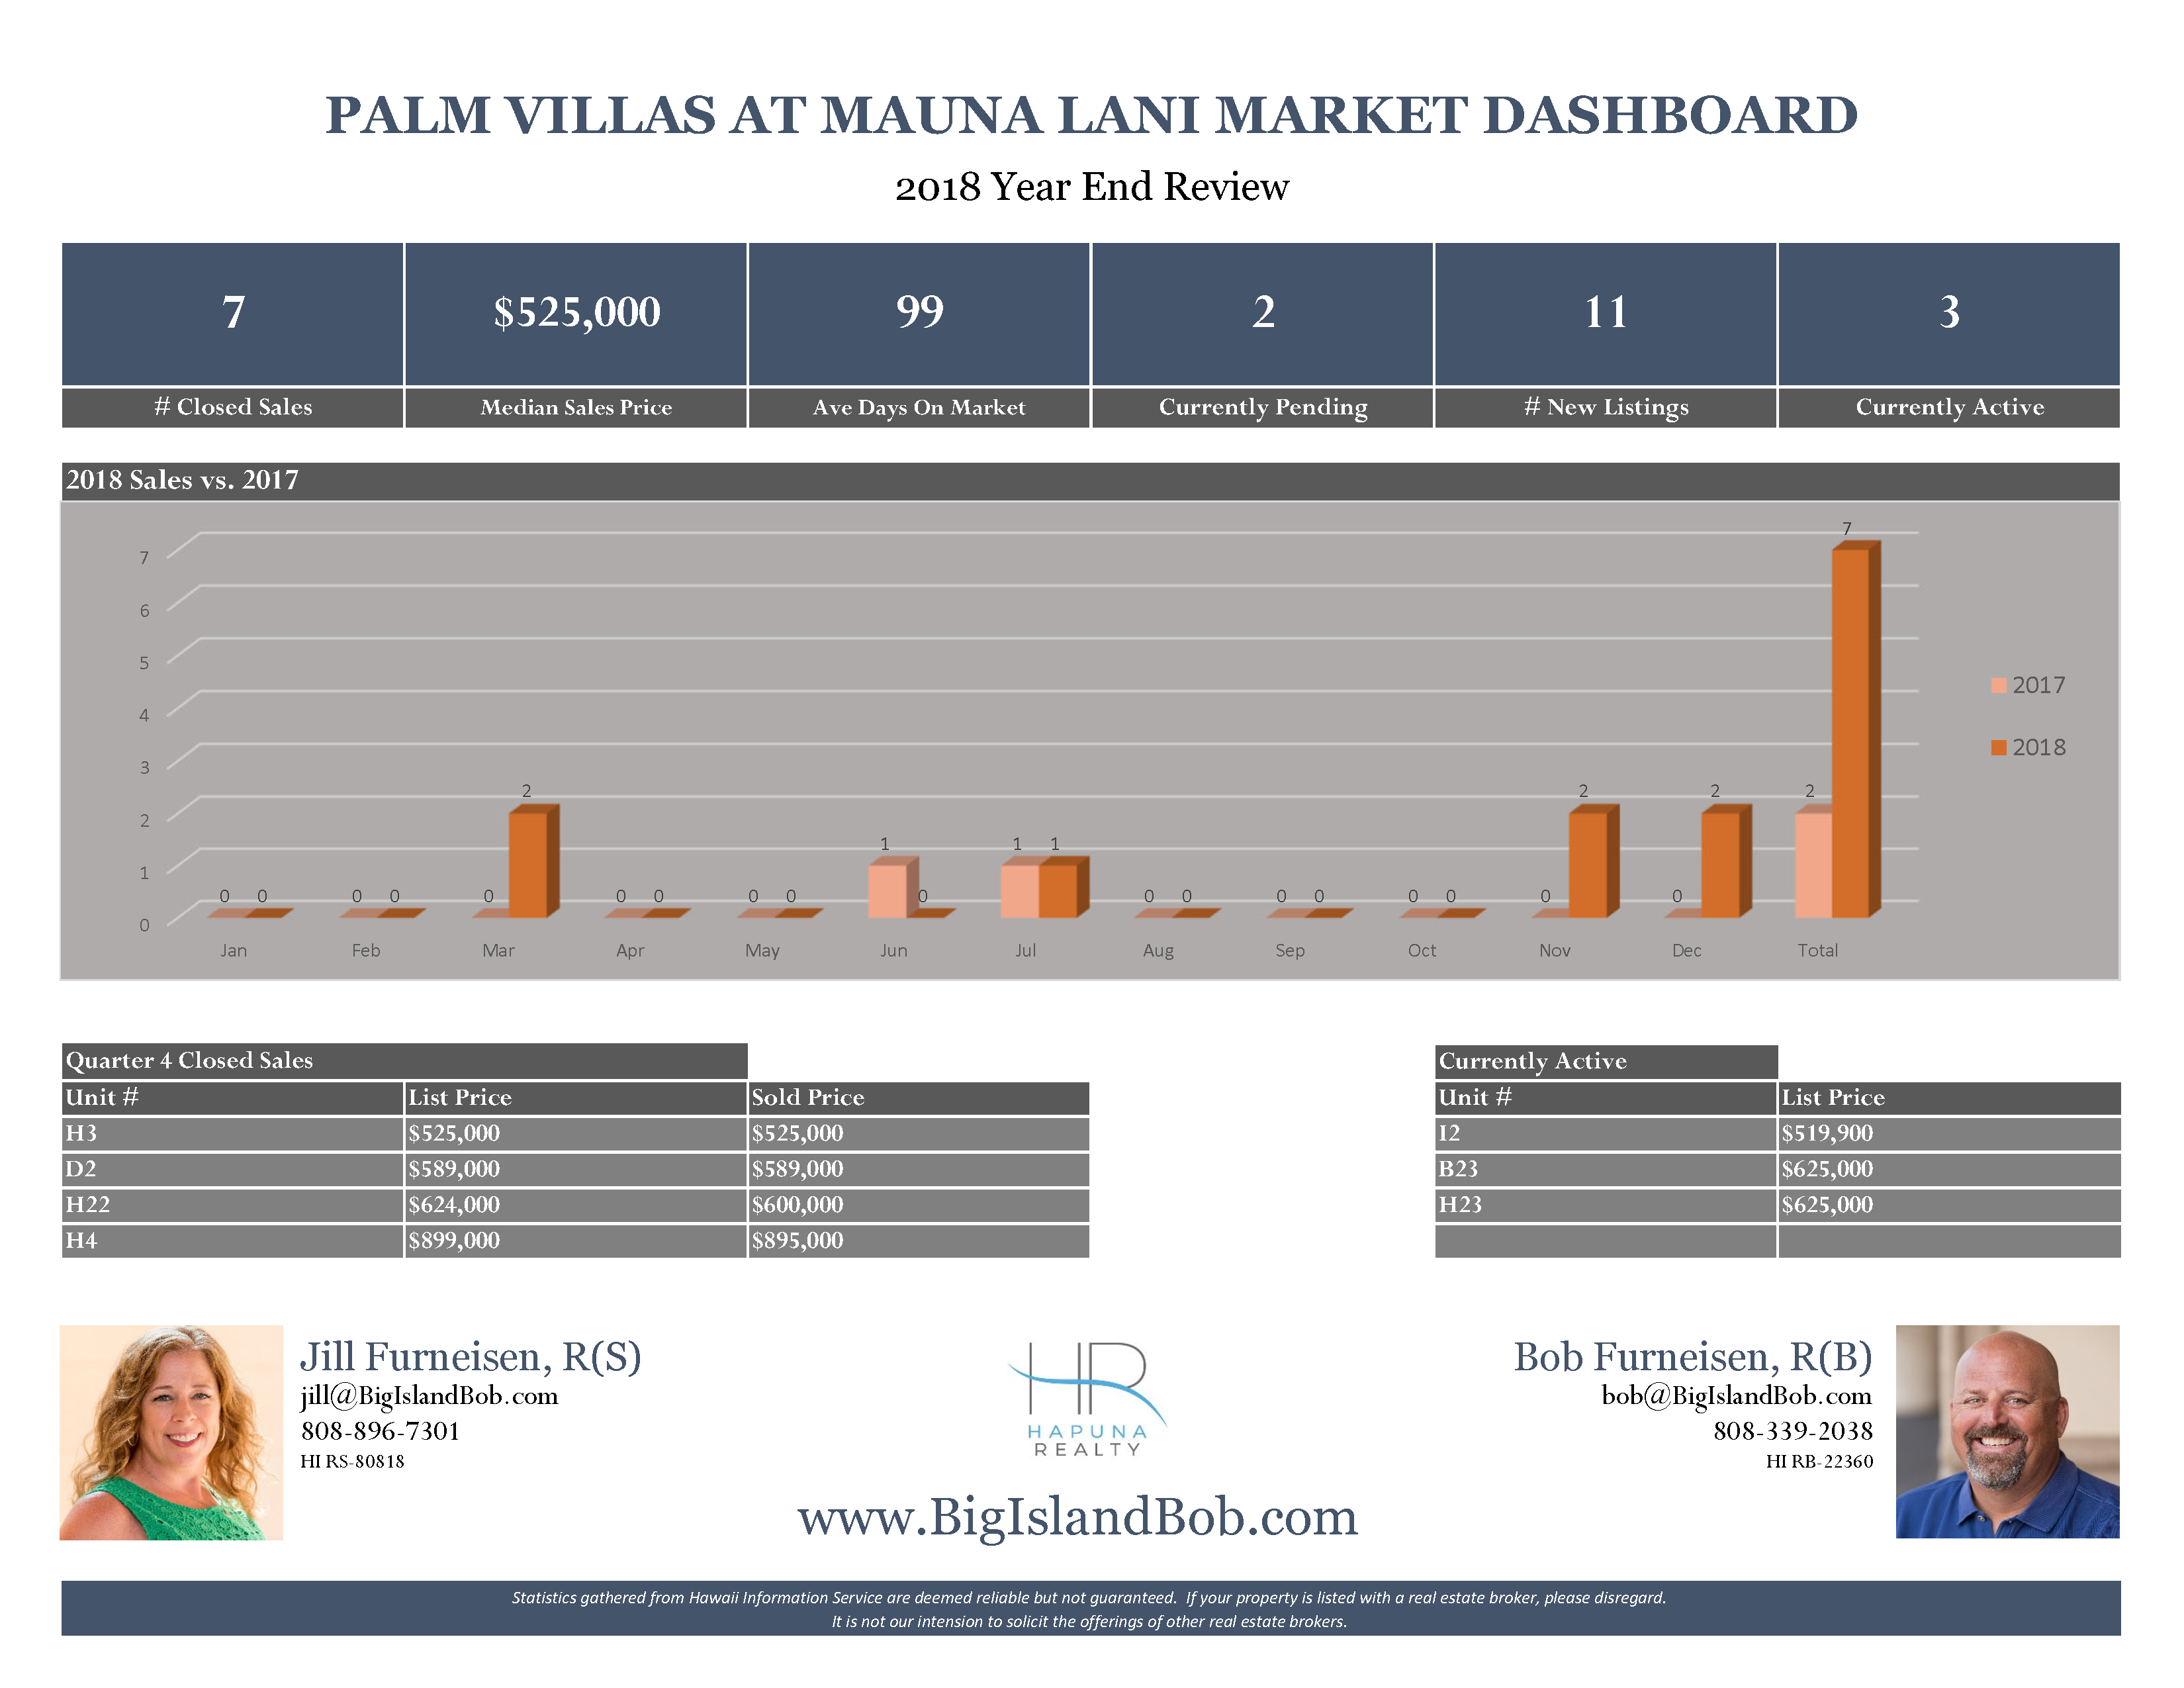 Palm Villas at Mauna Lani 2018 Year End Real Estate Market Dashboard